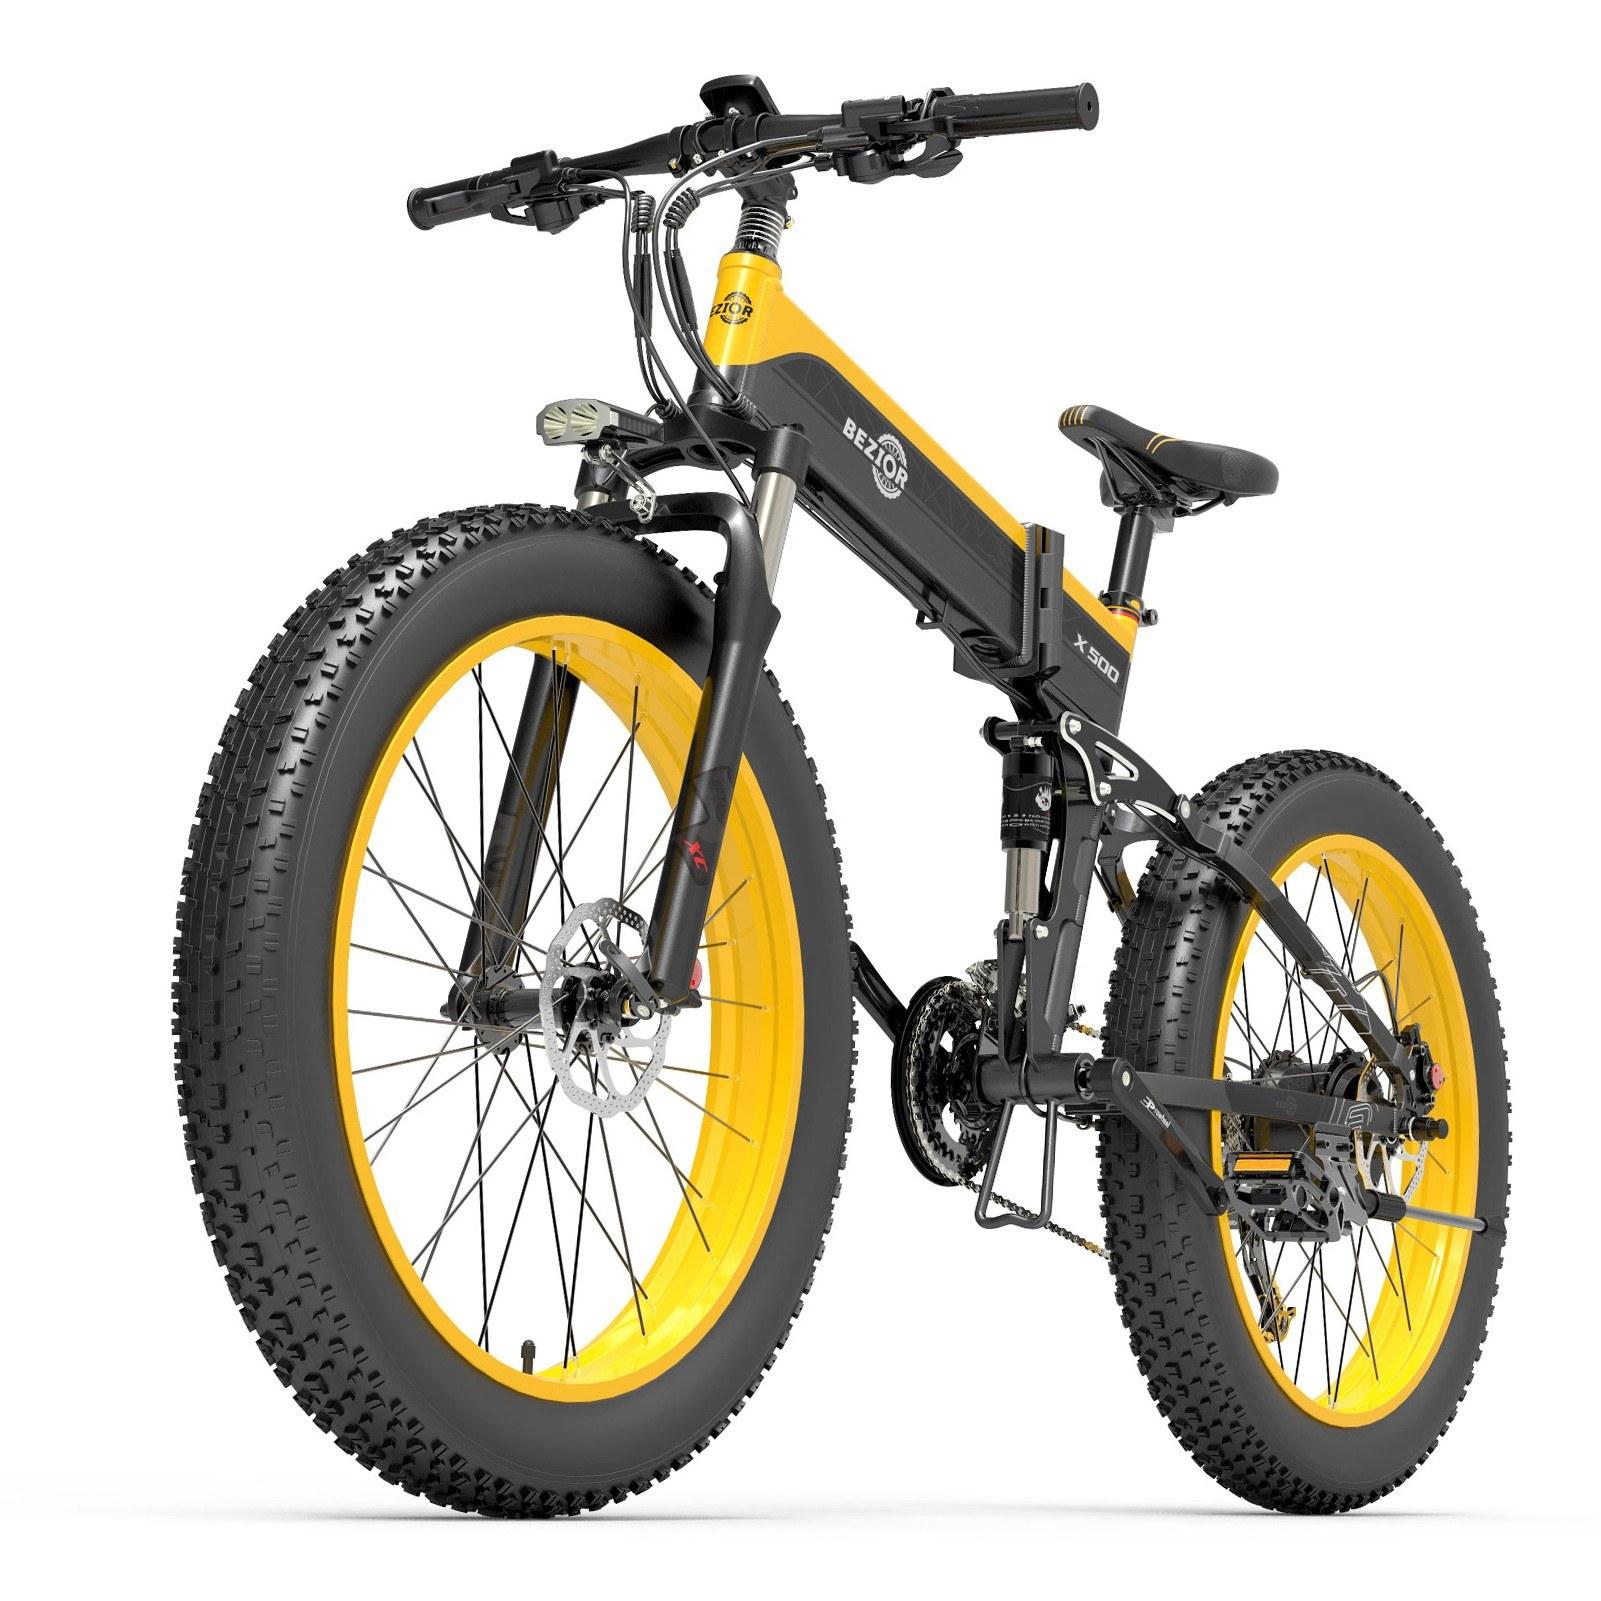 tomtop.com - [EU Warehouse] $623 OFF BEZIOR X500 500W Folding Electric Bike, $1376.46 Inclusive of VAT